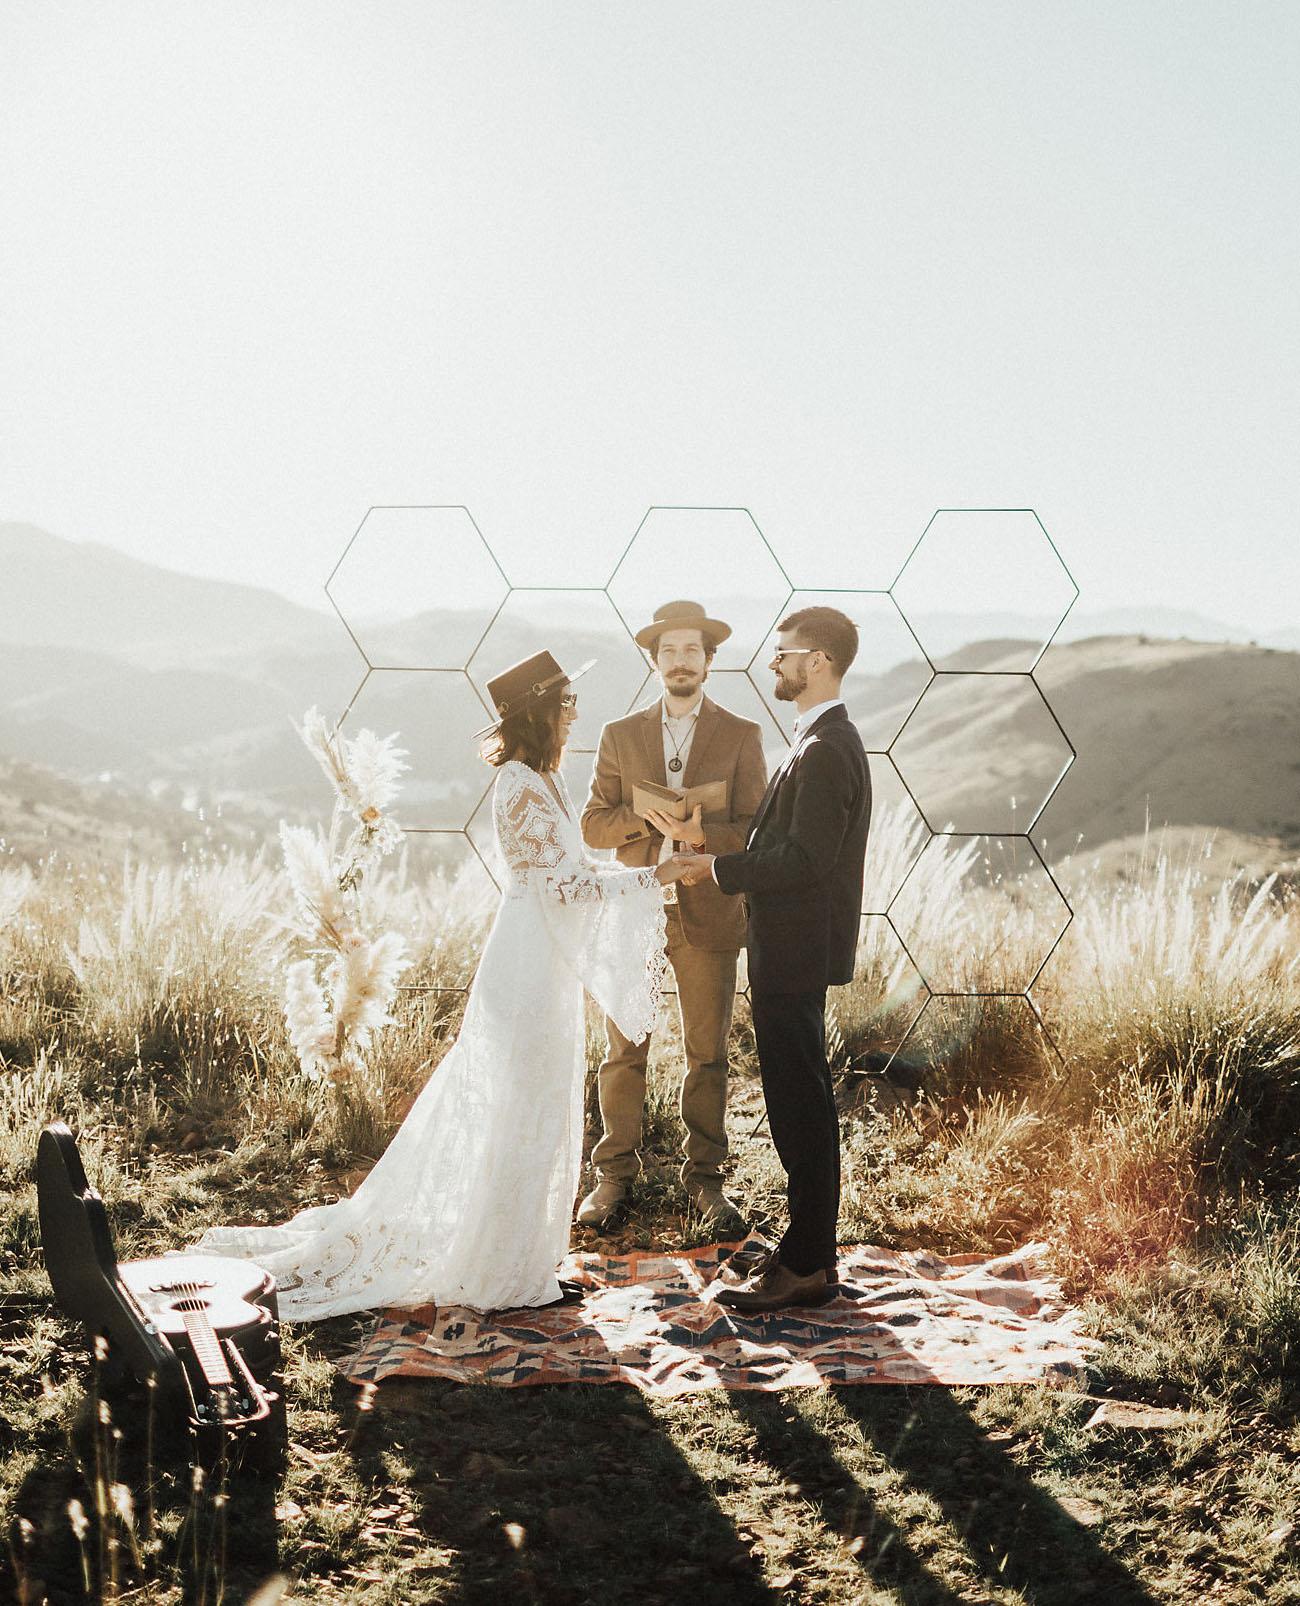 octagon backdrop